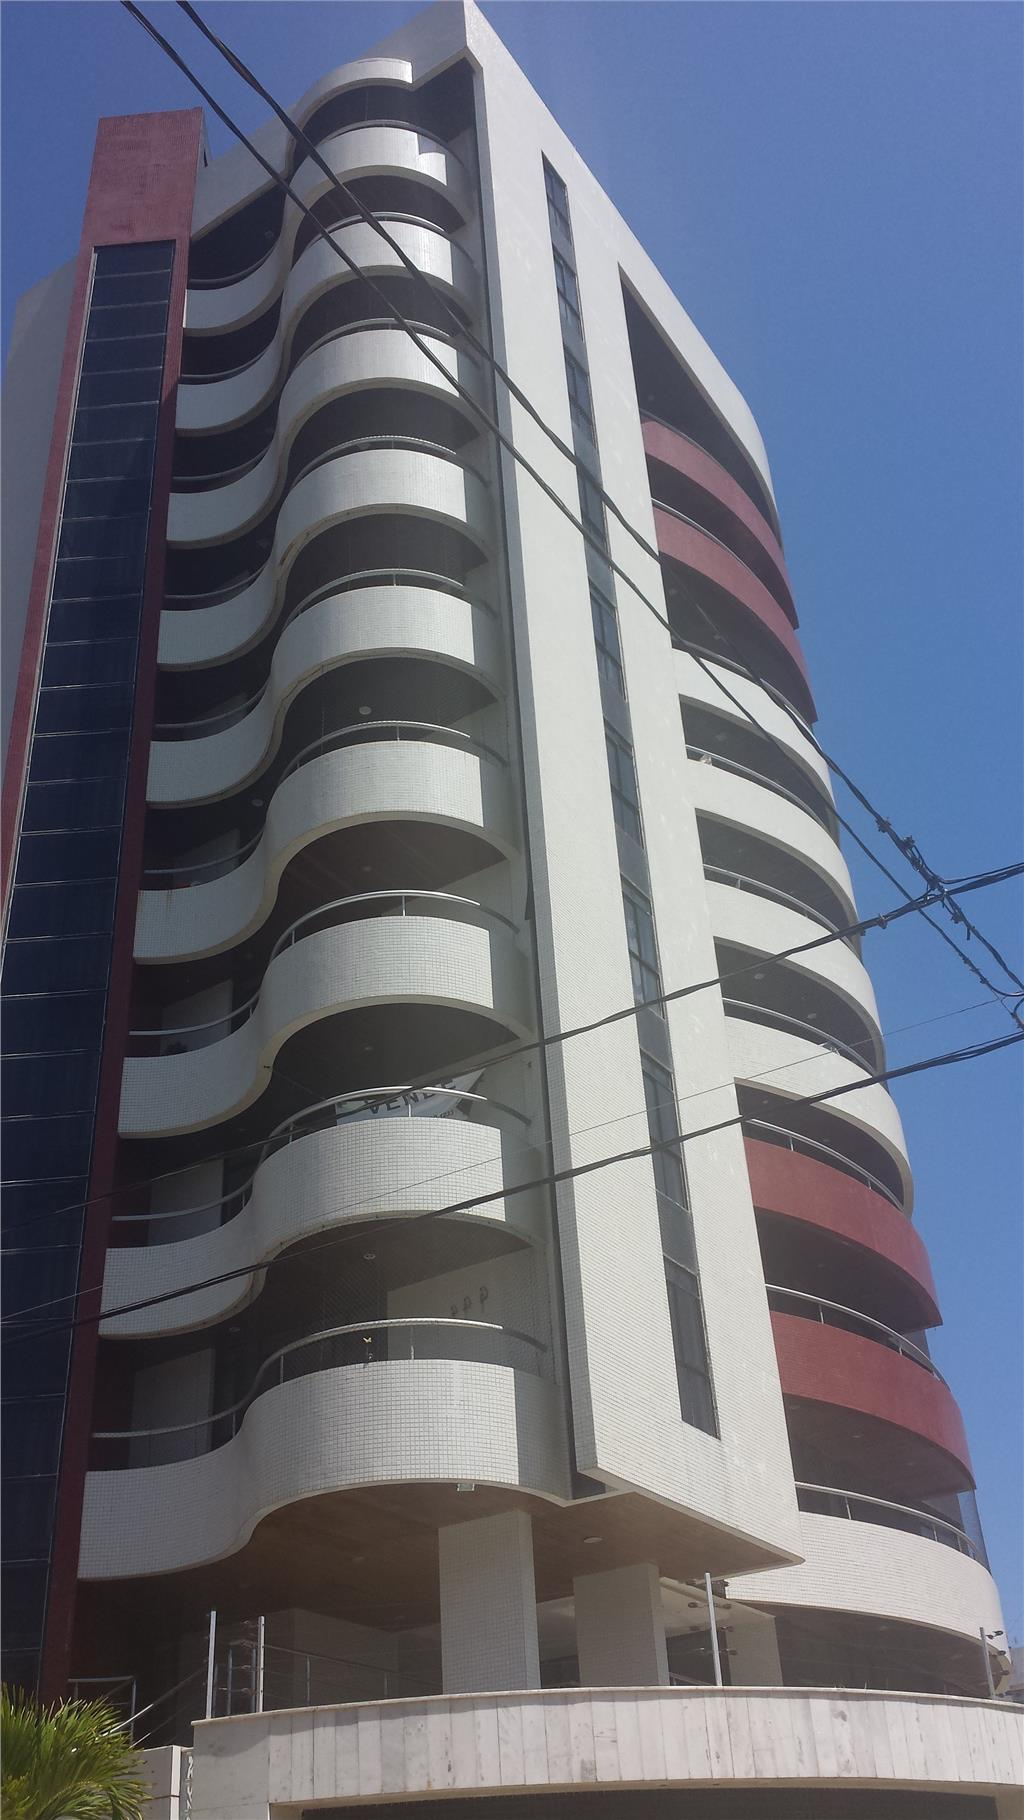 Apartamento residencial à venda, Intermares, Cabedelo - AP3297.